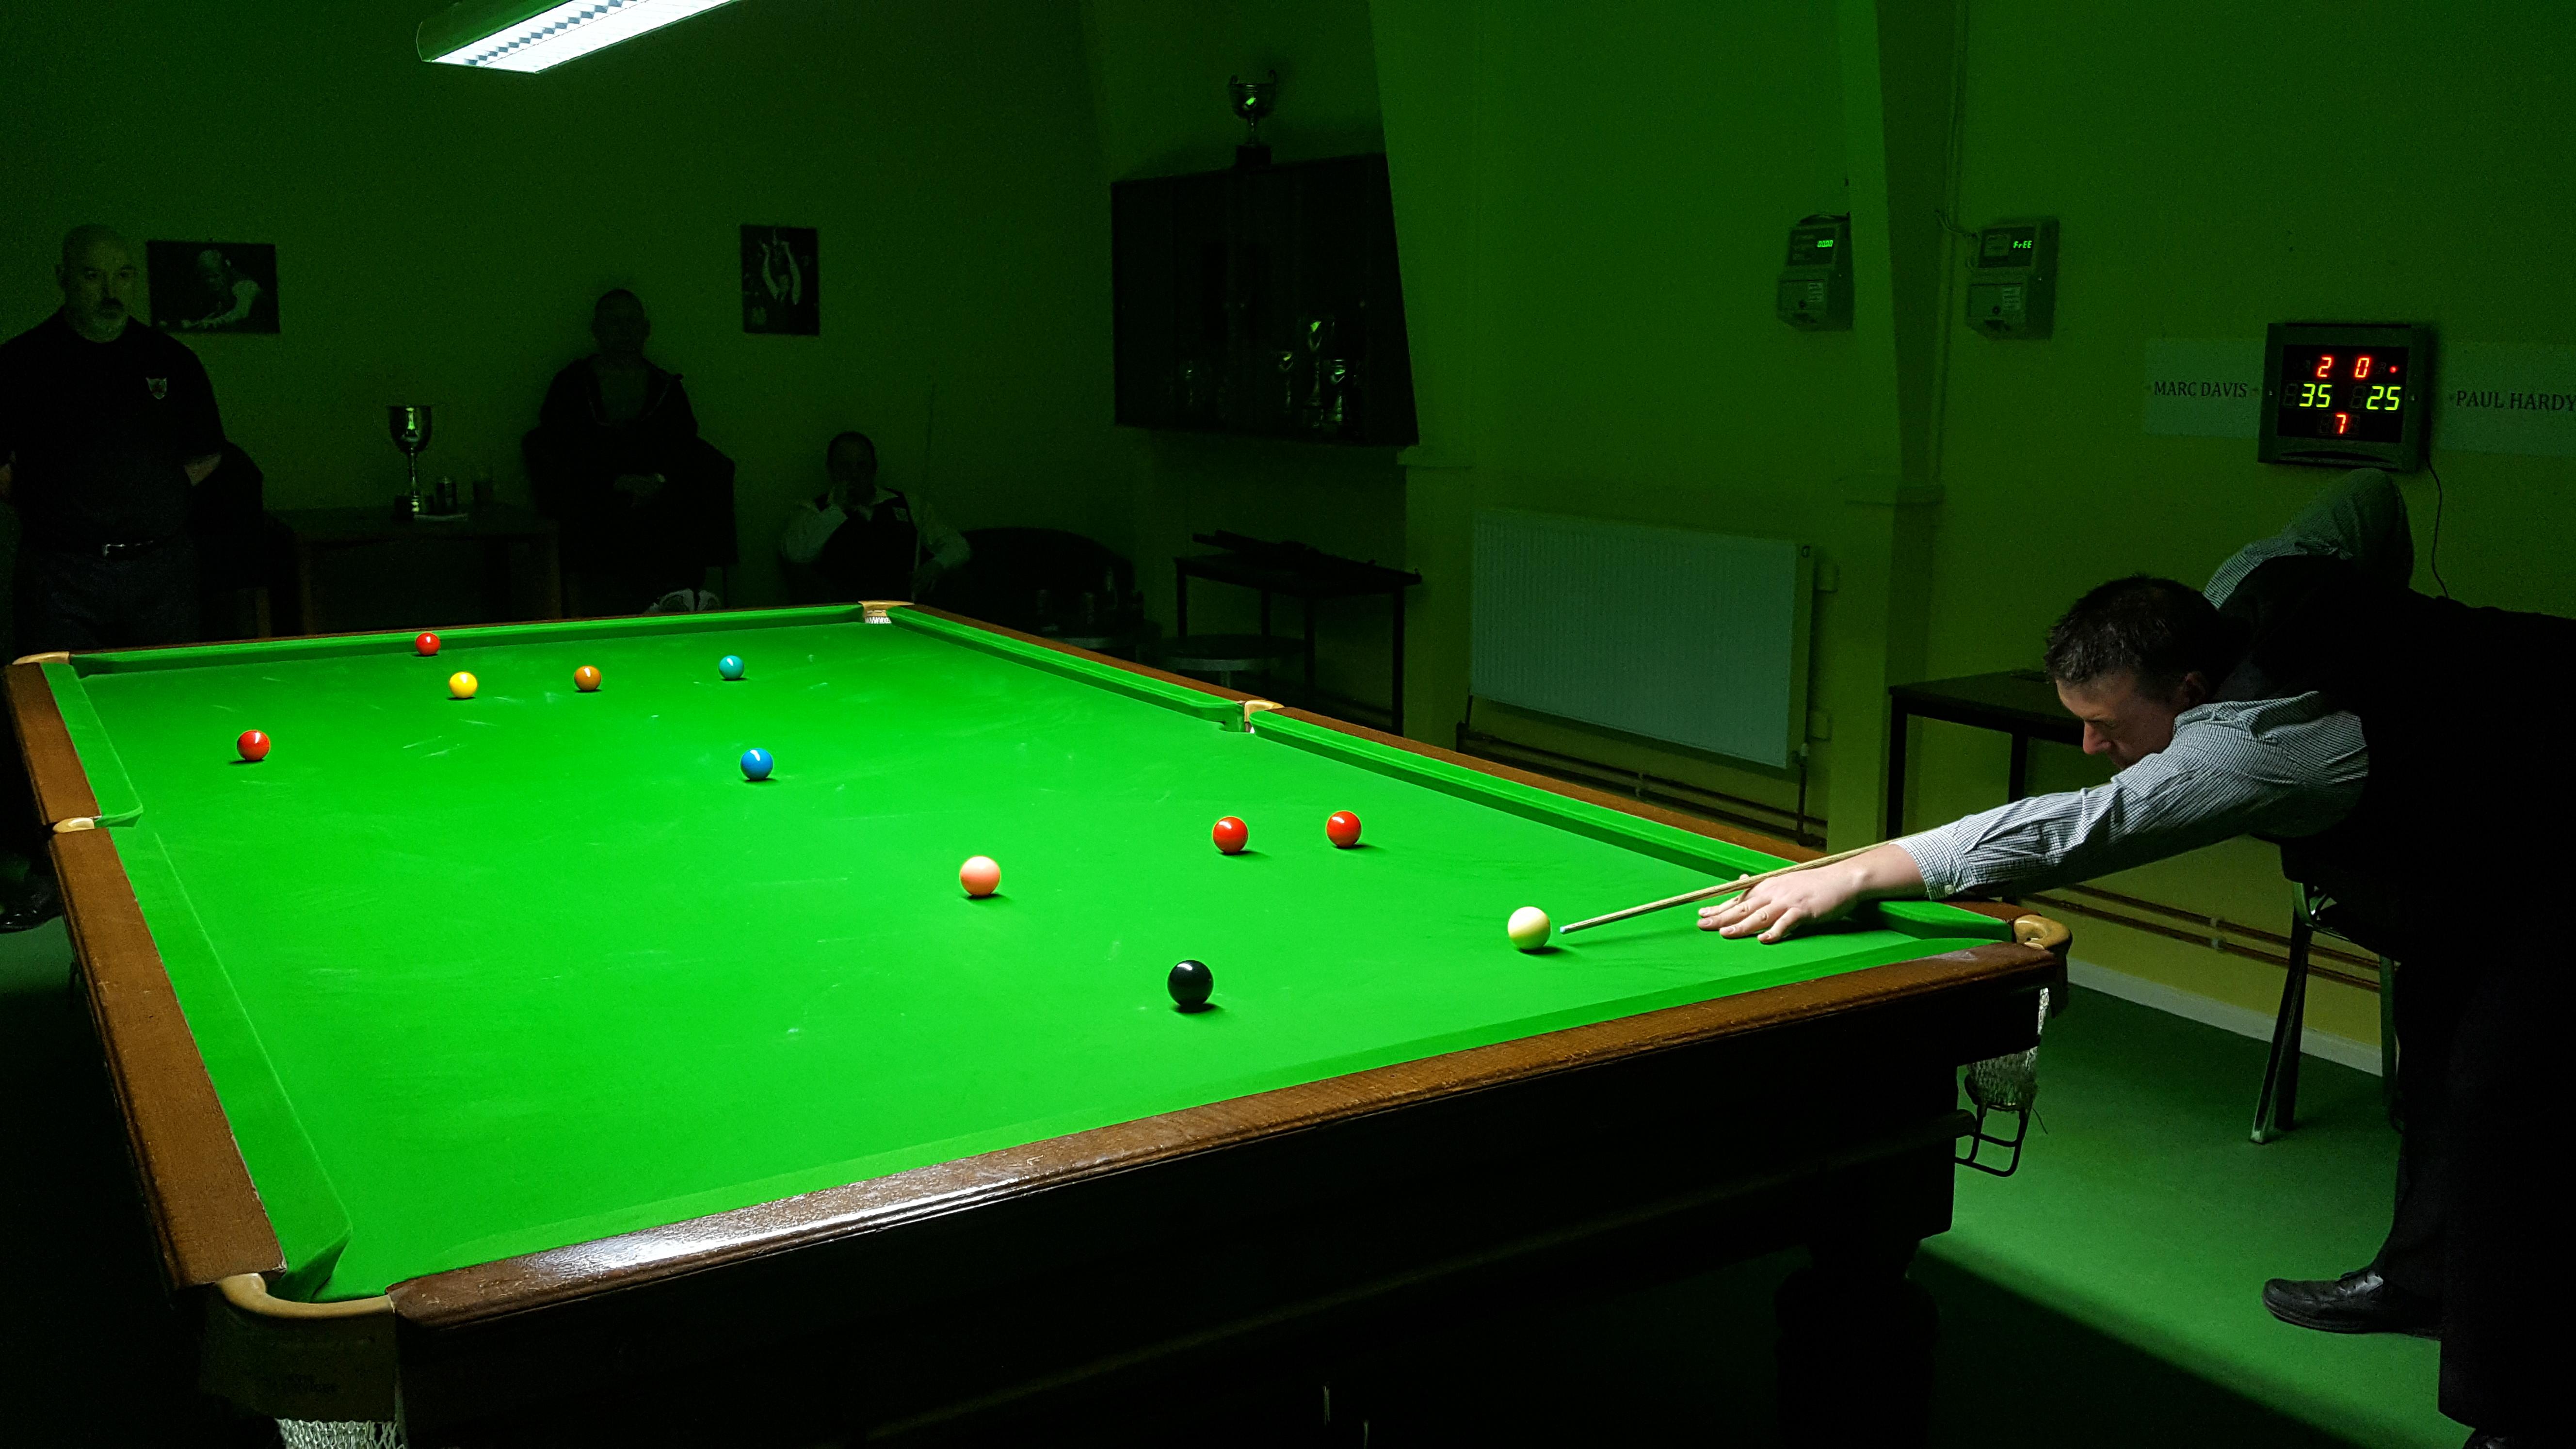 Guernsey Billiards Snooker Association: Aberdeen Licensed Clubs Billiards & Snooker Association